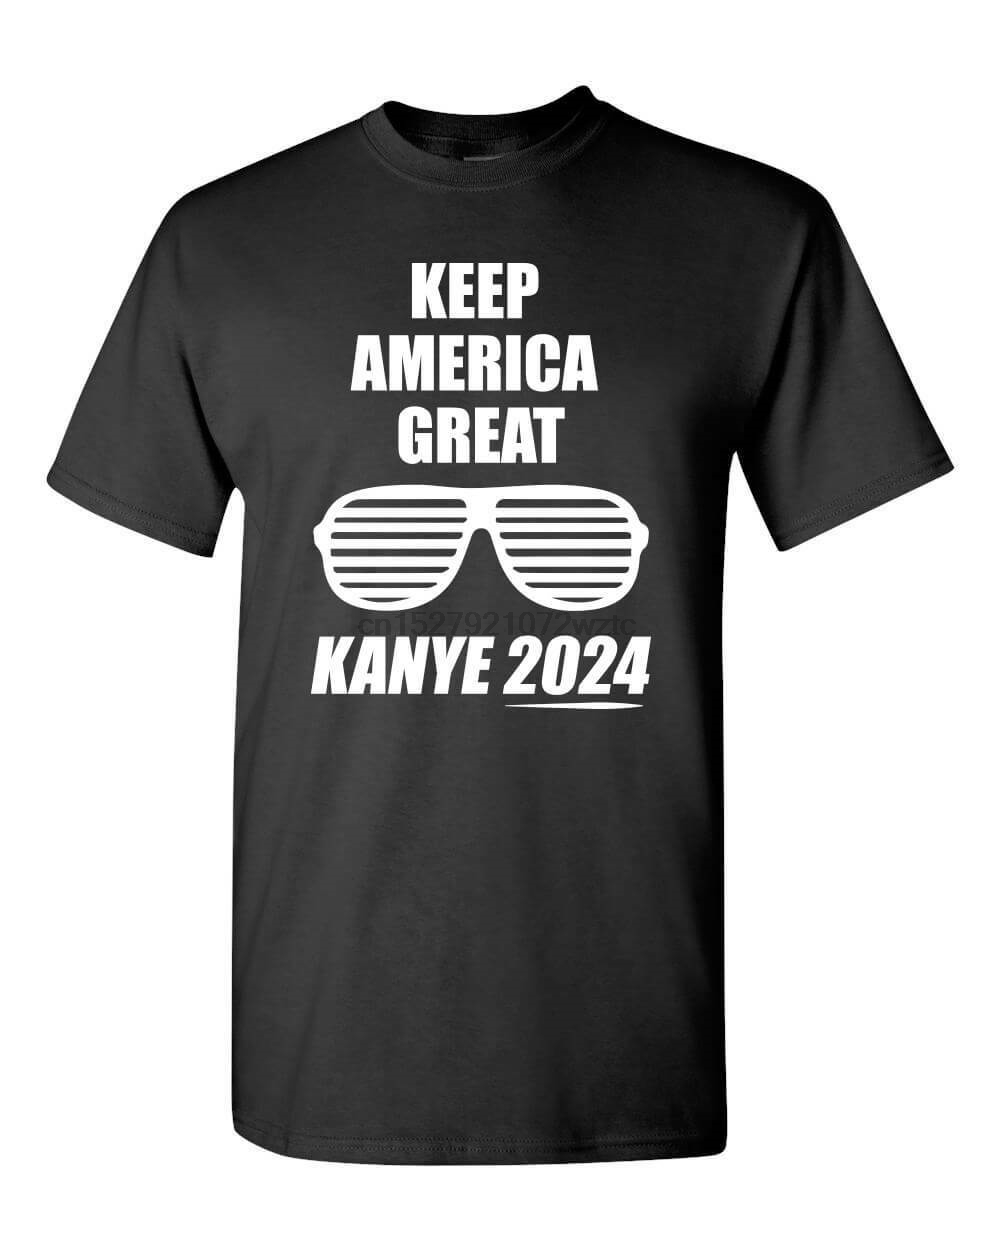 Kanye 2024 Funny Trump Dragon Blood Red Pill Woke Candace Owens MAGA T-Shirt